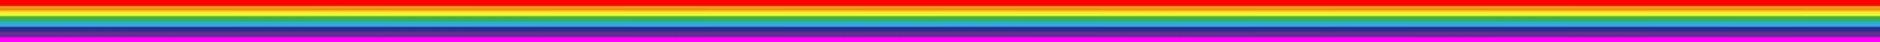 rainbow-stripes-background-1486057937CzP.jpg